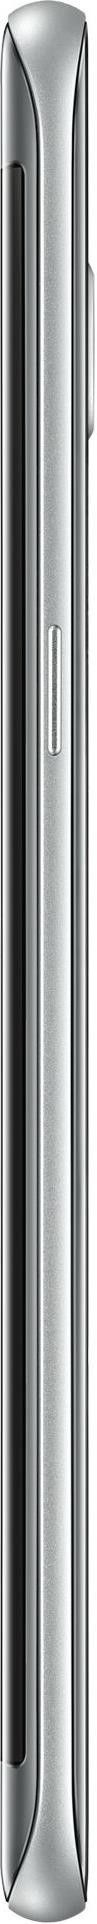 Мобильный телефон Samsung Galaxy S7 Edge Duos G935 (SM-G935FZSUSEK) Silver - 1